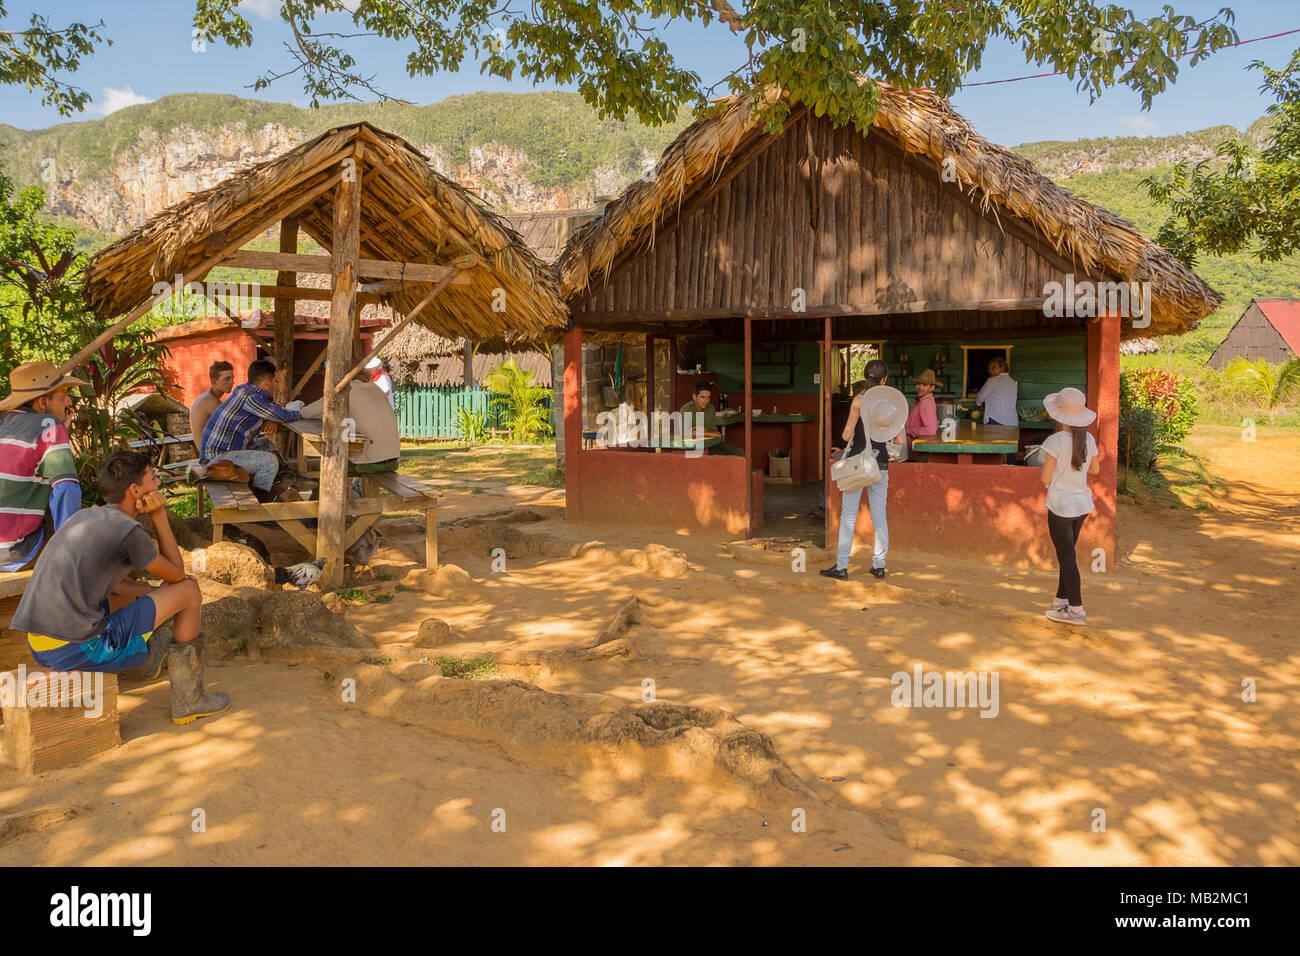 Vinales, Cuba - December 5, 2017: Cubans and tourists relaxing at farm bar - Stock Image